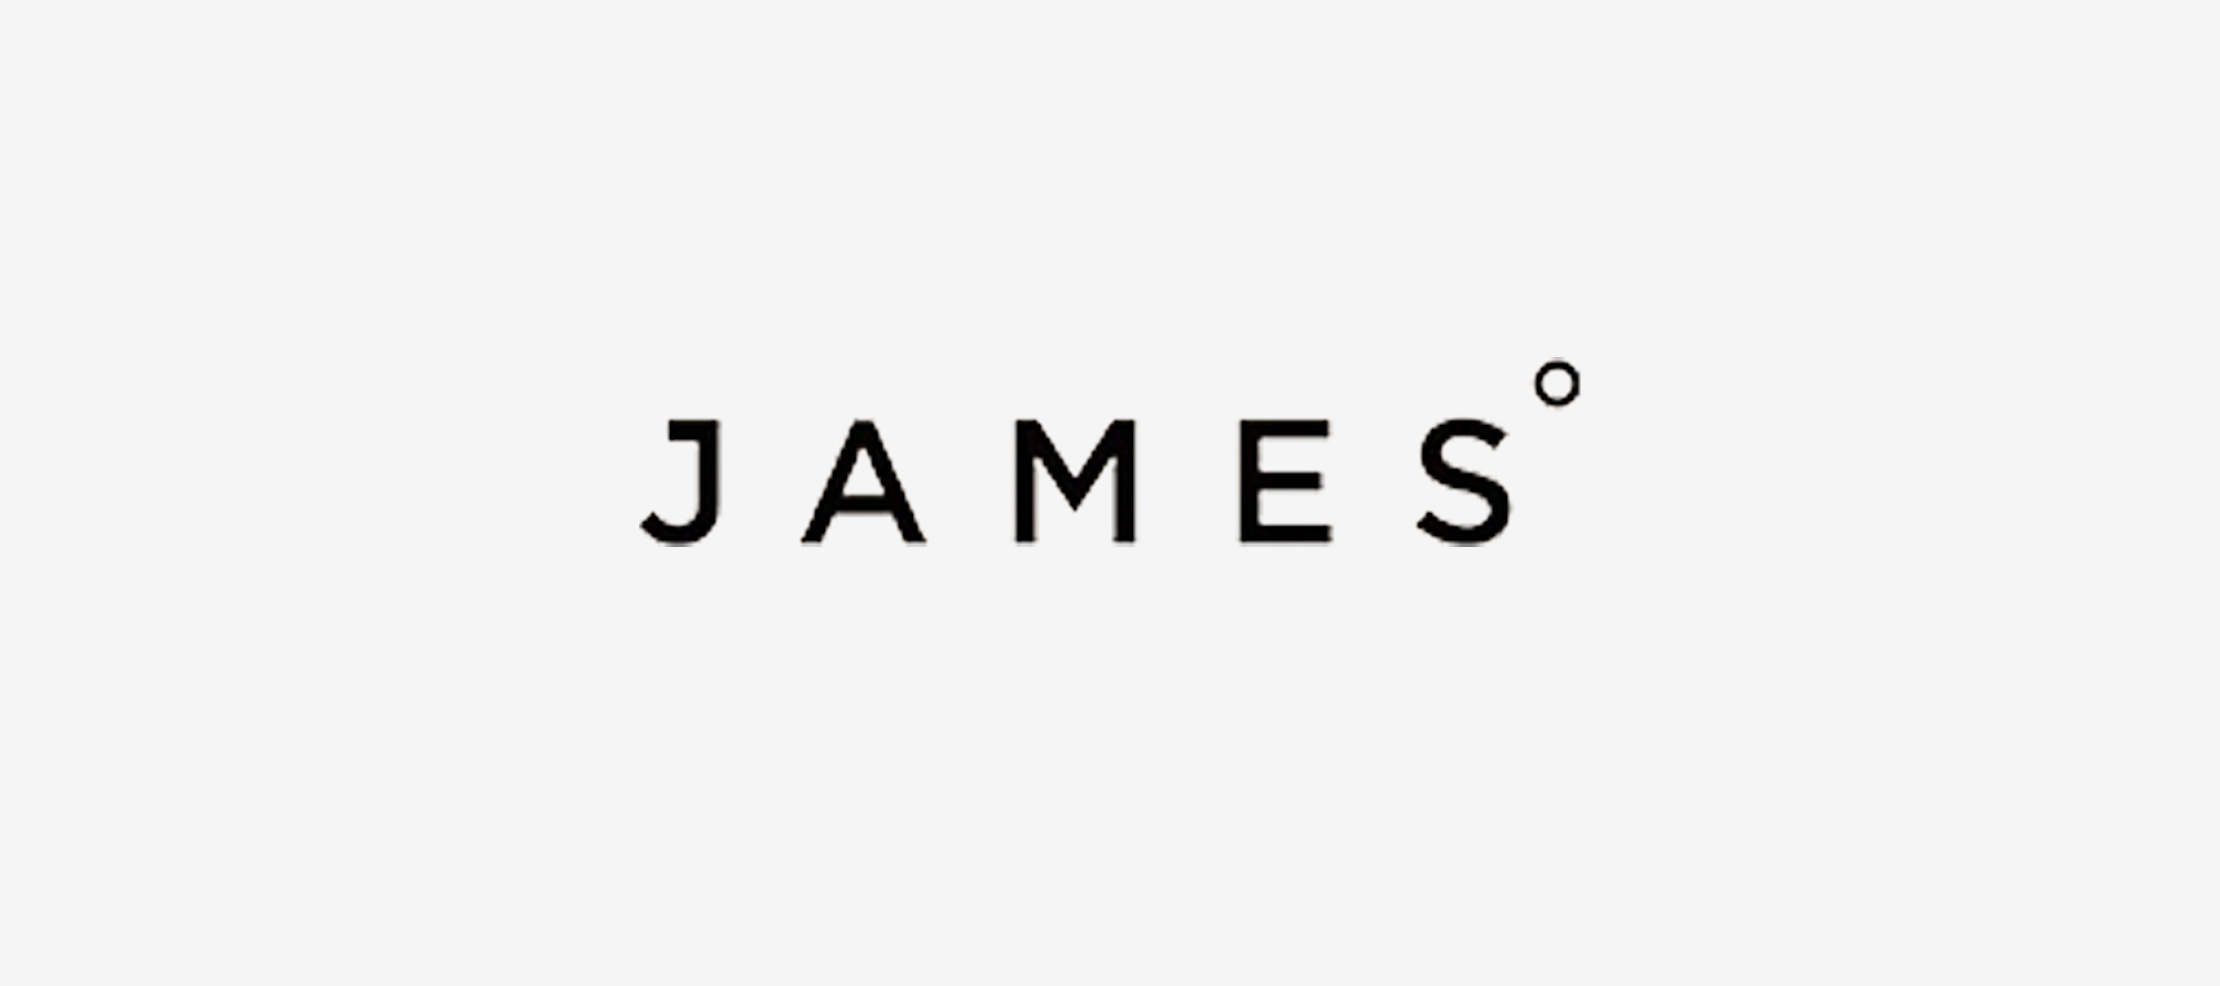 The James Brand Logo